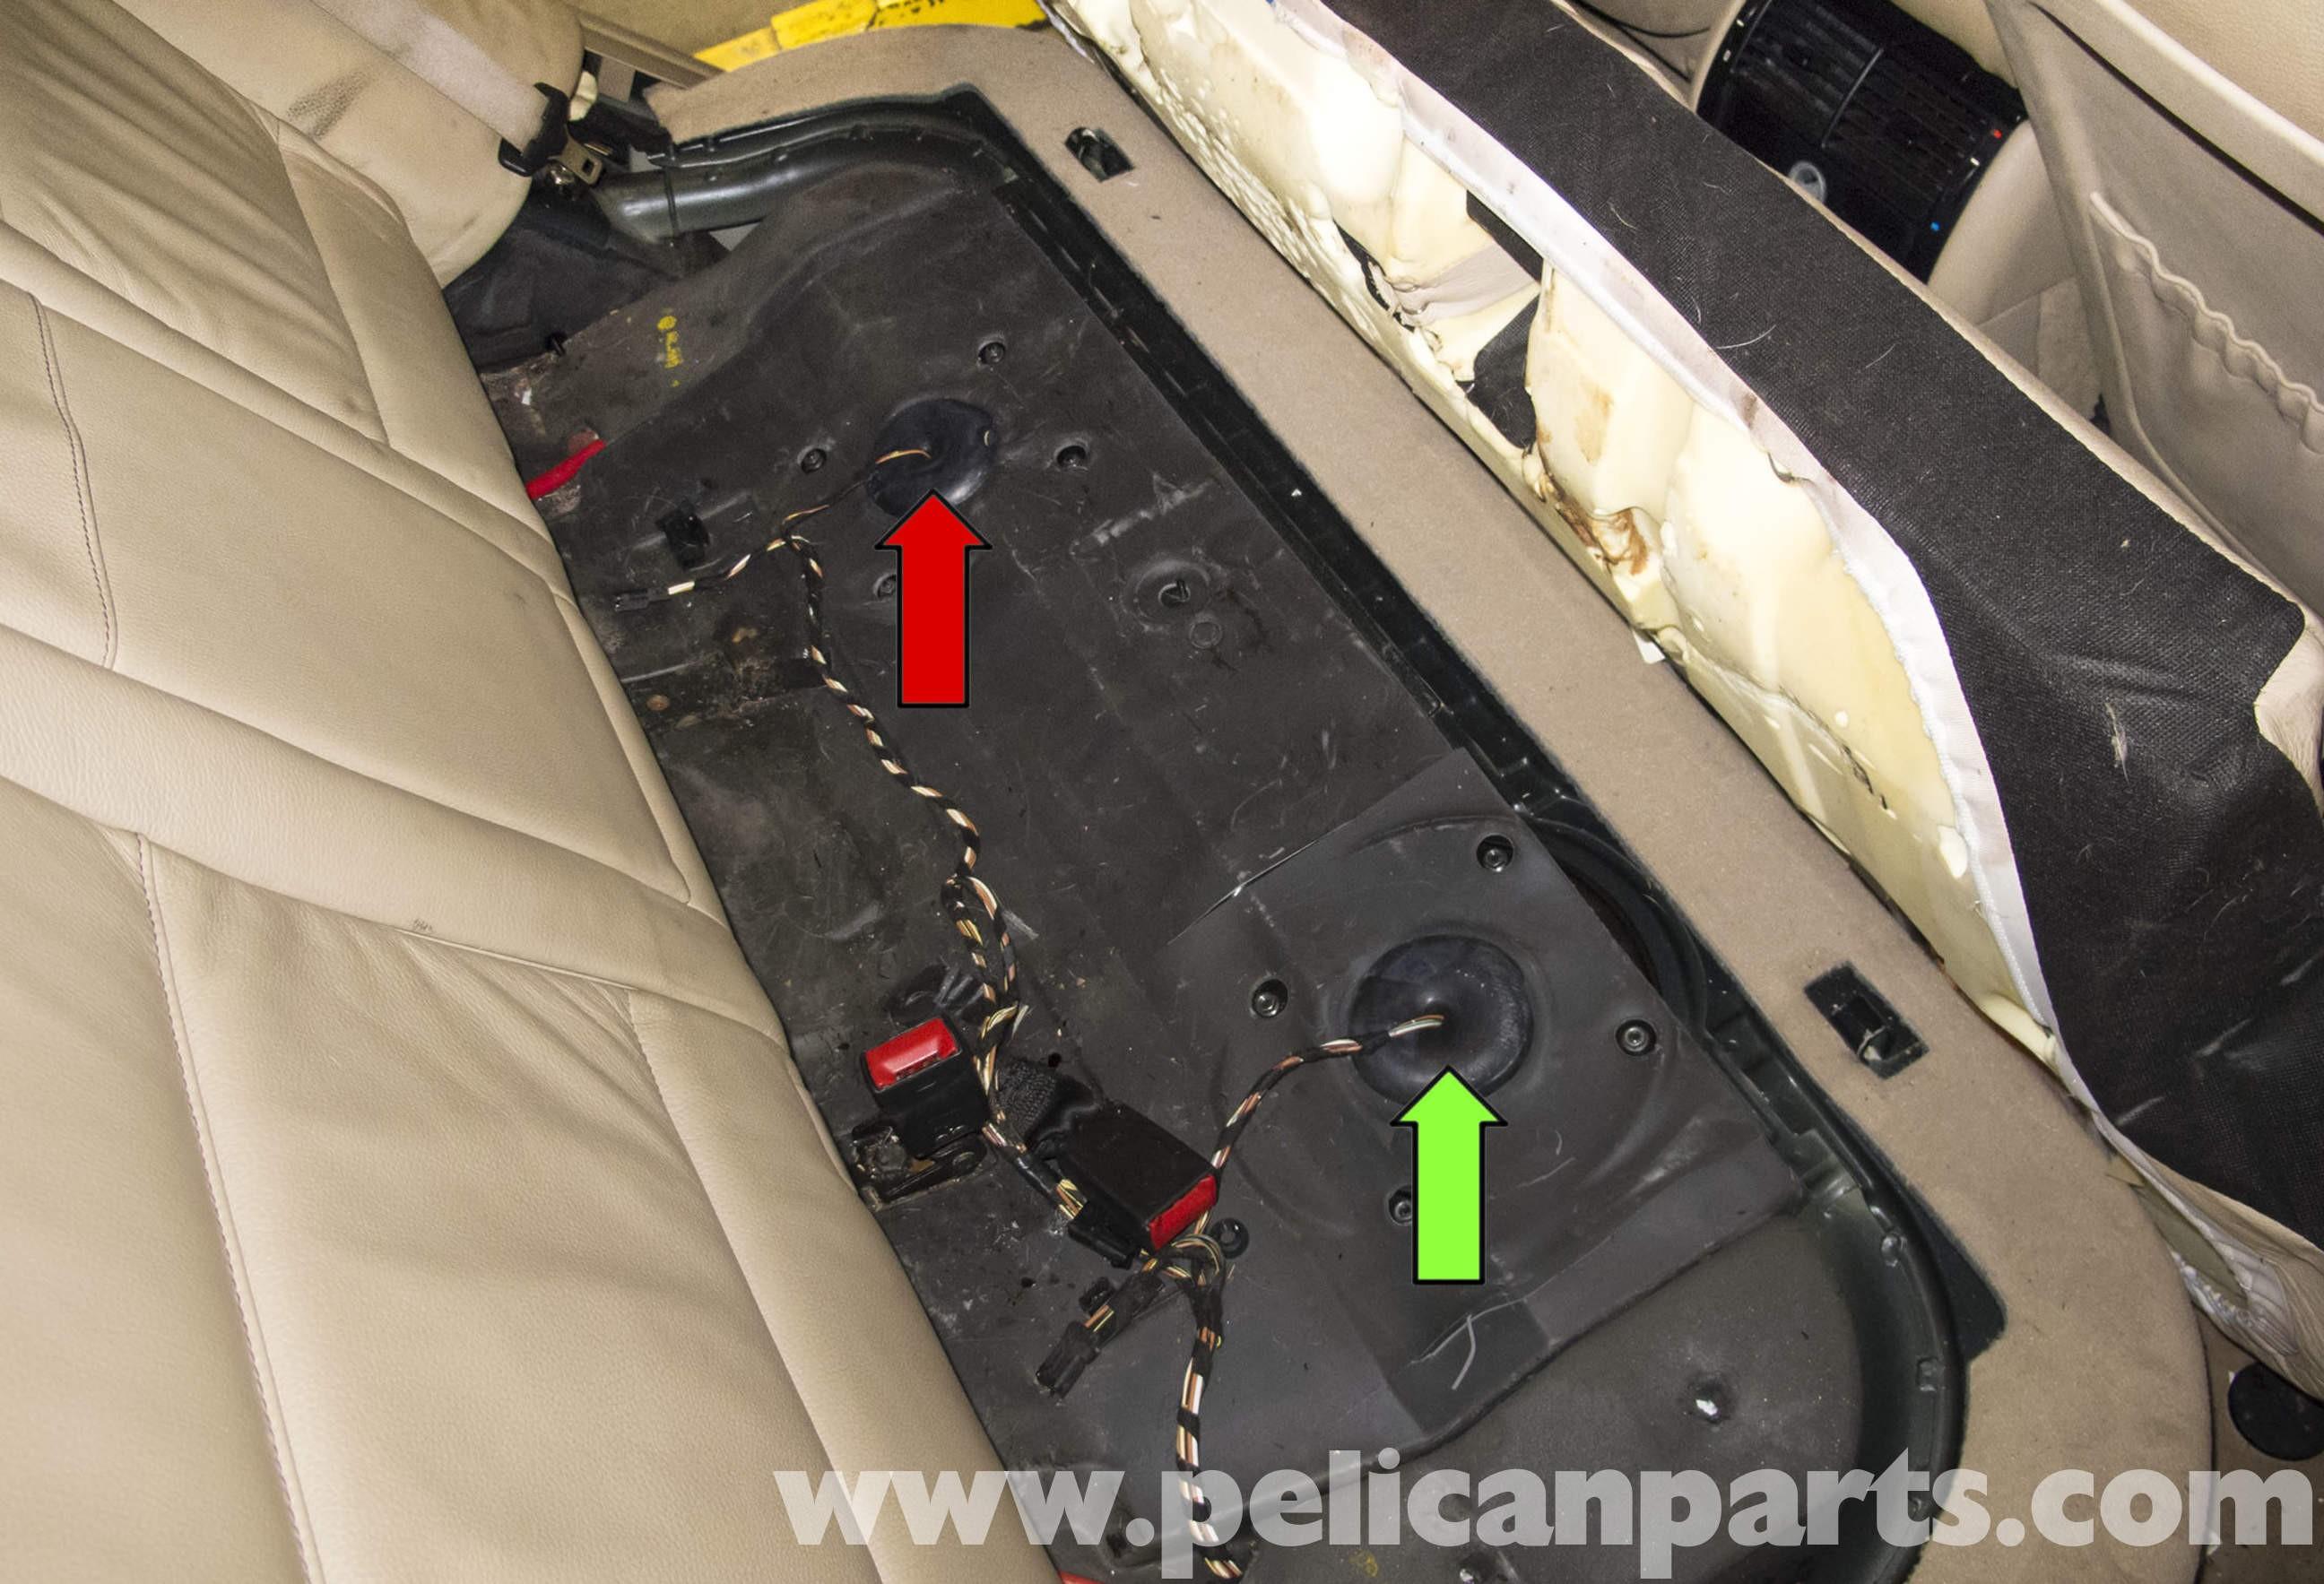 Diagram Of Car Fuel System Bmw X5 Fuel Pump Testing E53 2000 2006 Of Diagram Of Car Fuel System